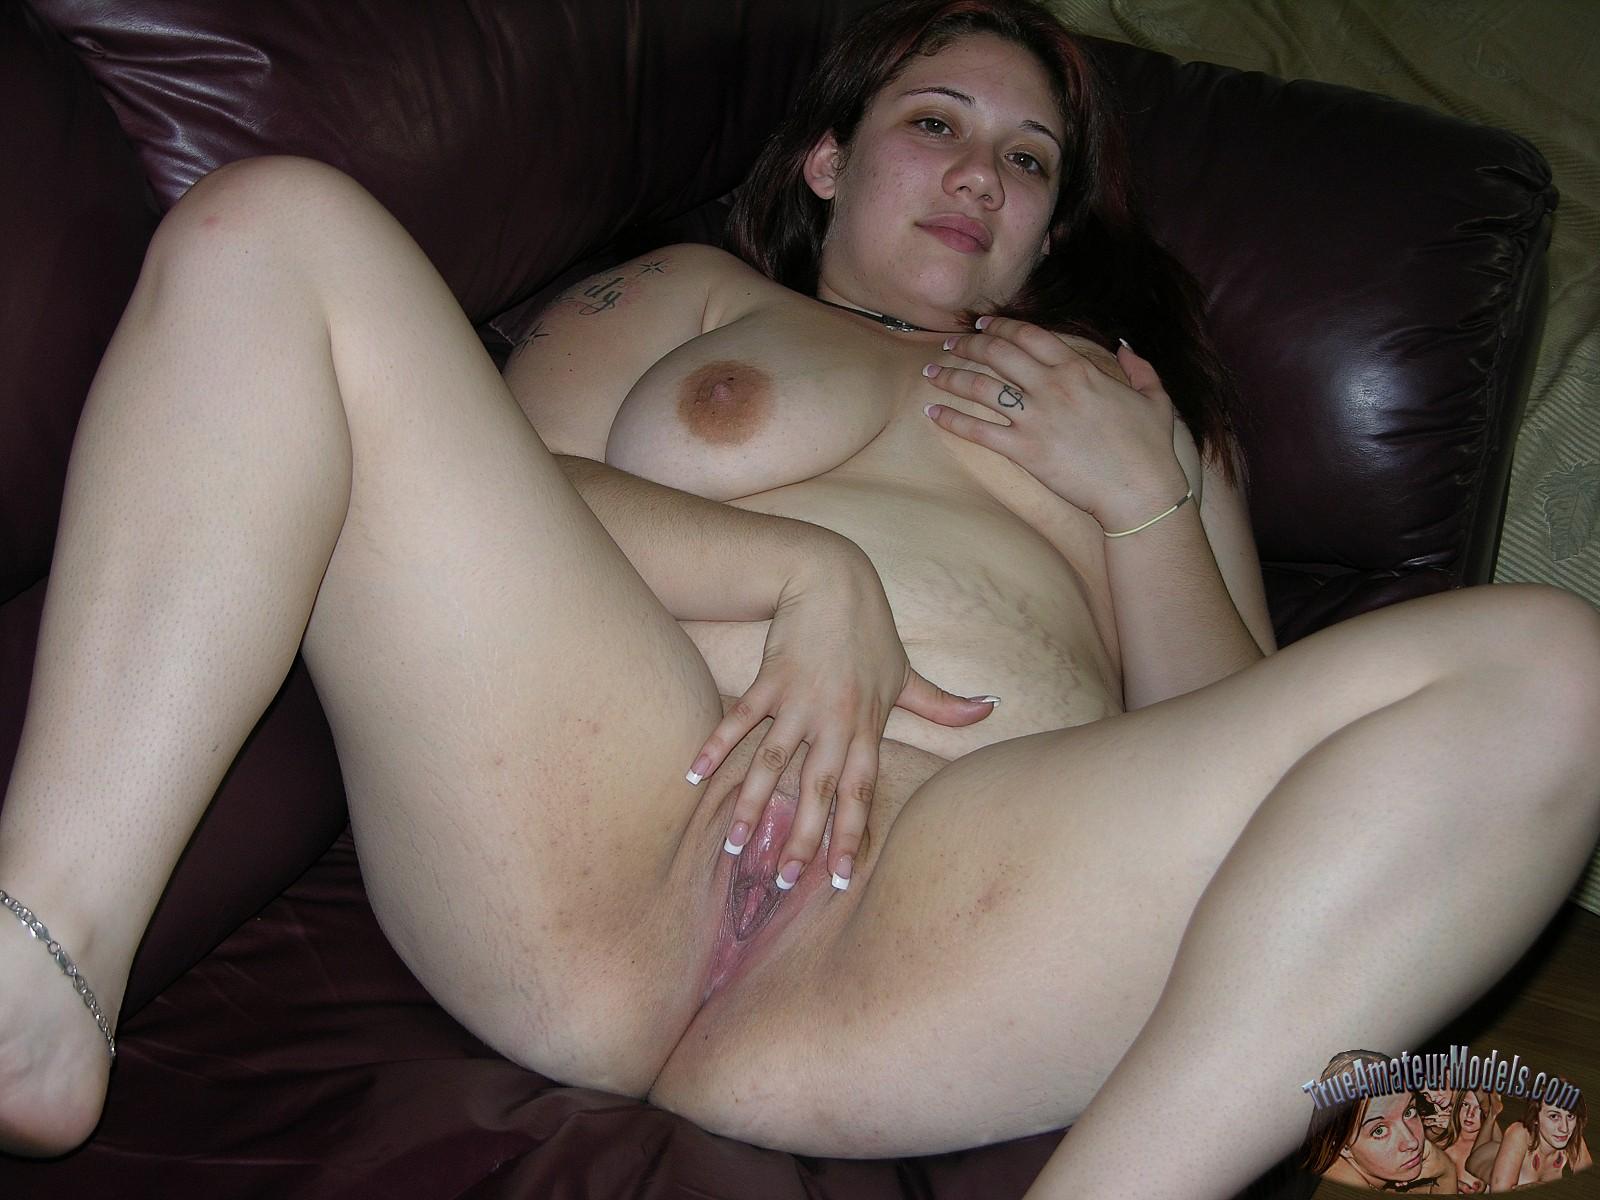 Yana gupta nude on bed